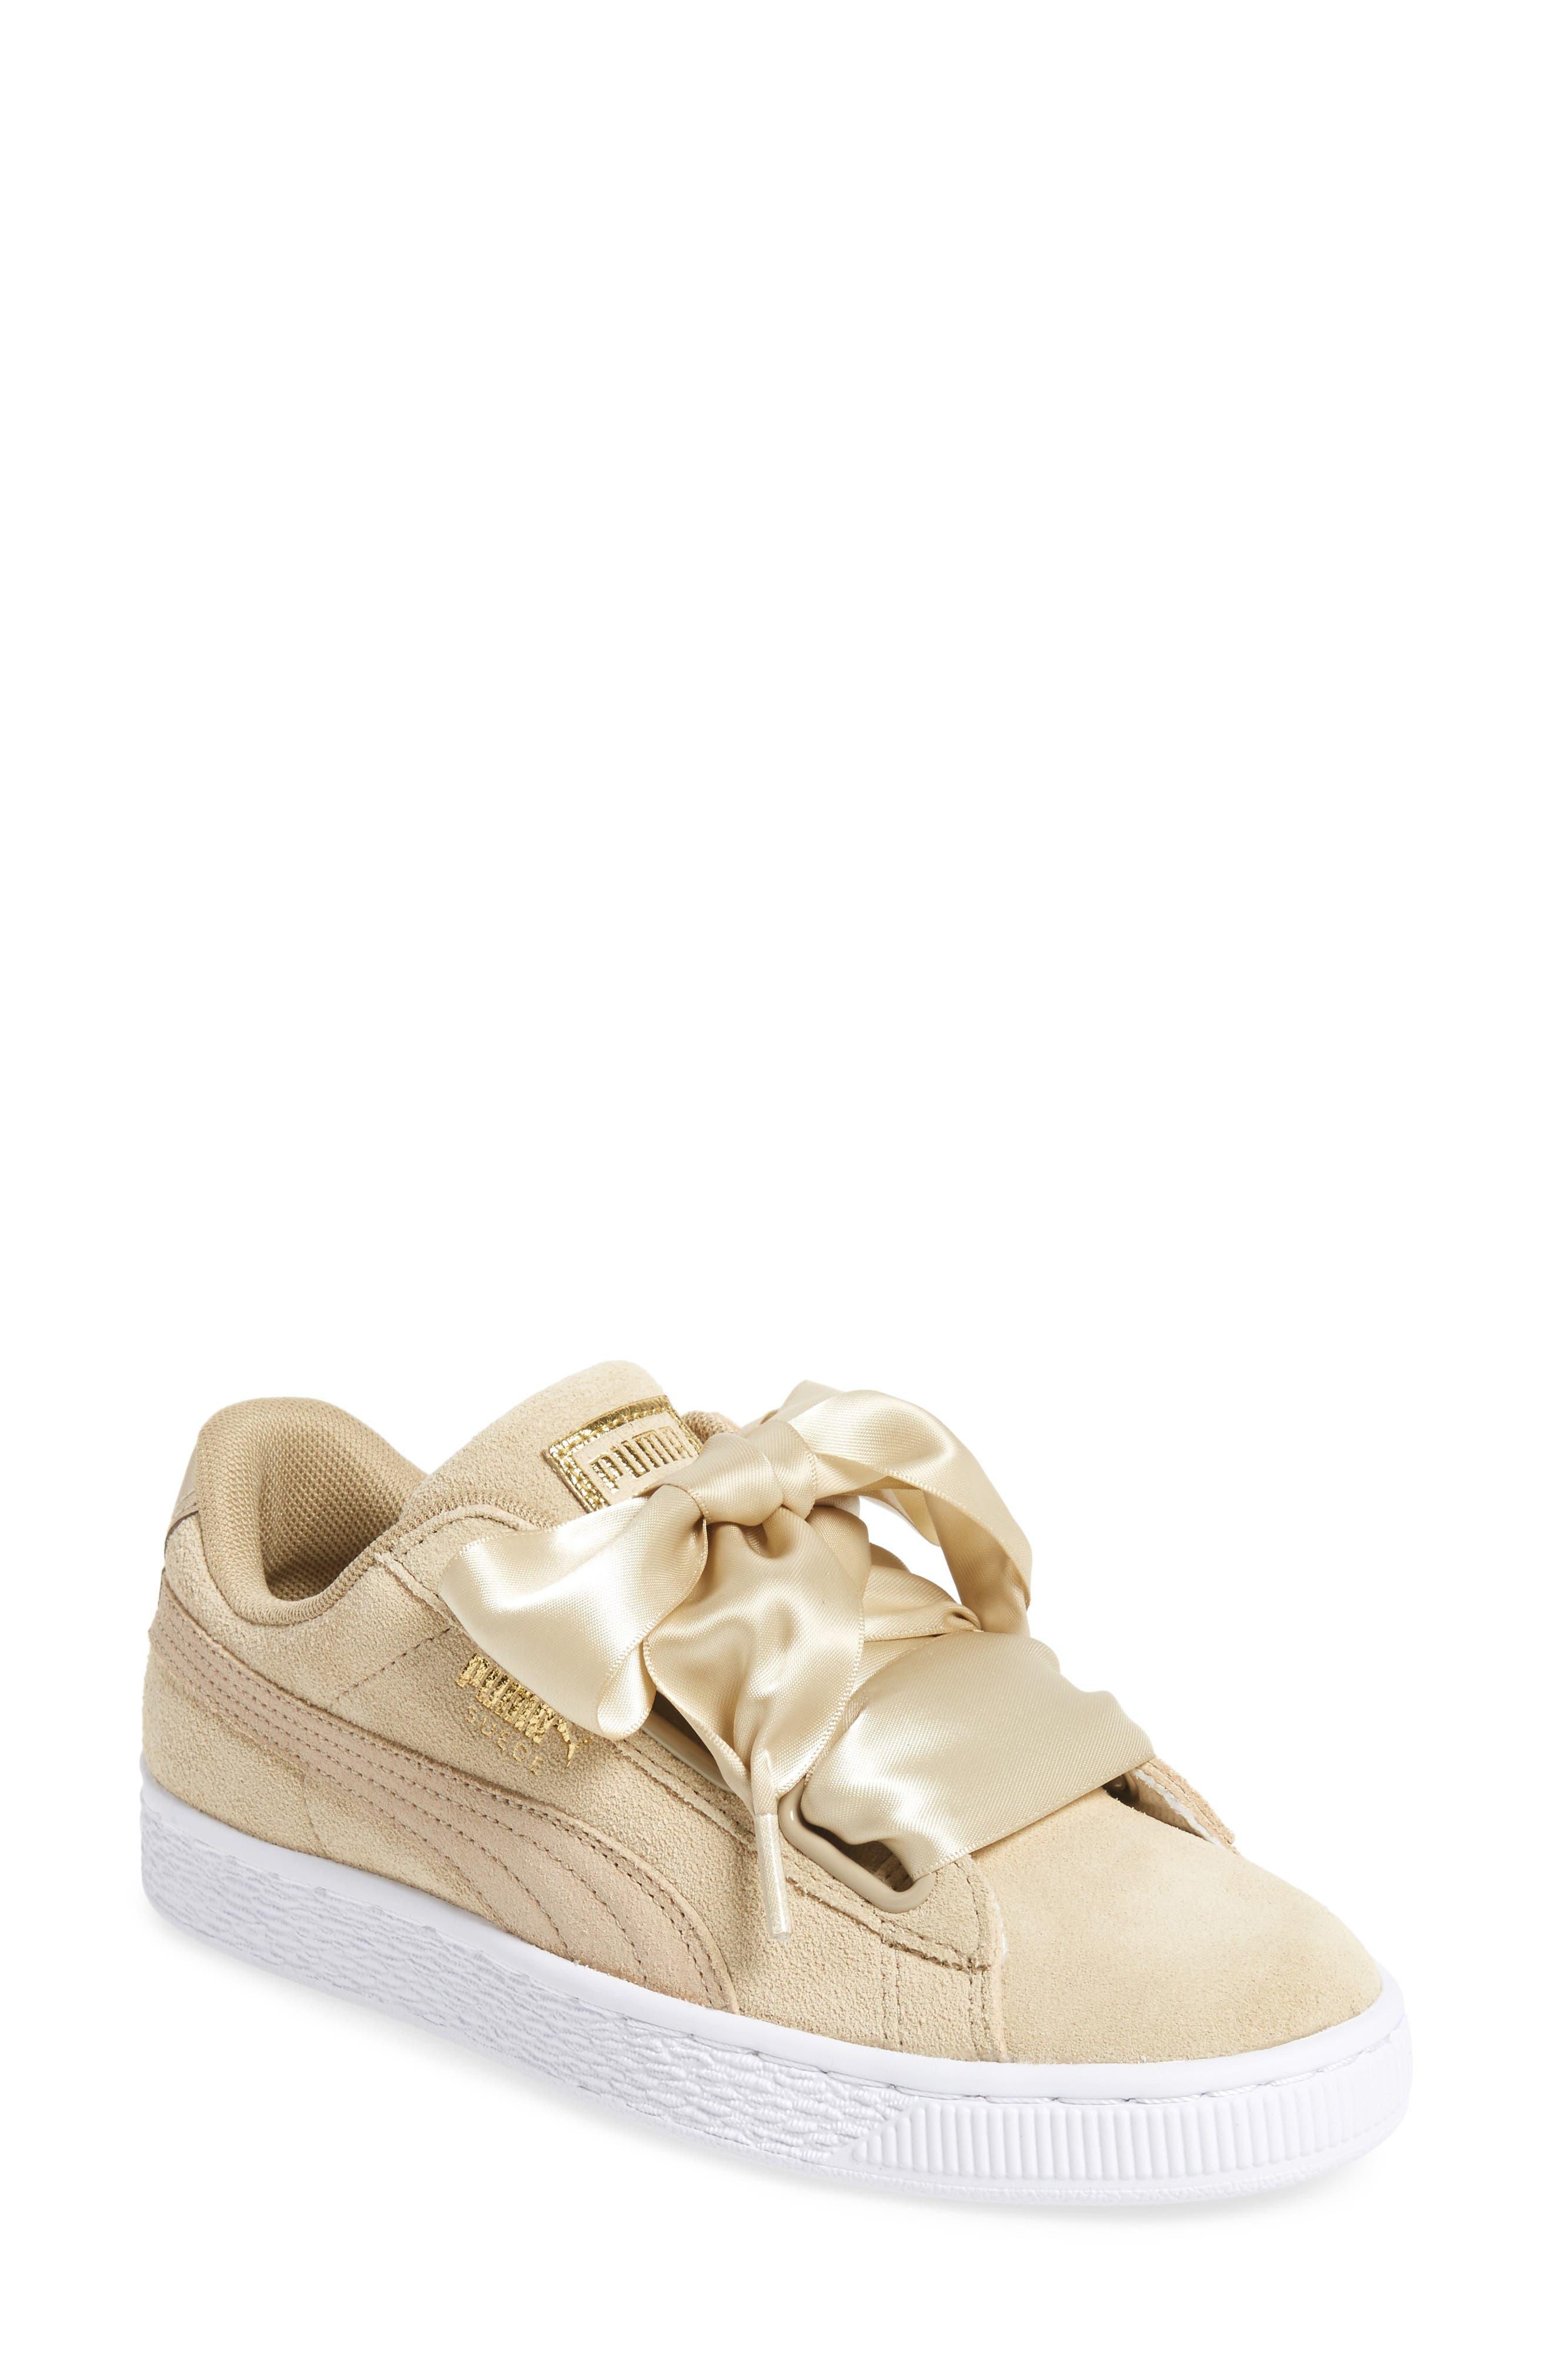 Alternate Image 1 Selected - Puma Basket Heart Sneaker